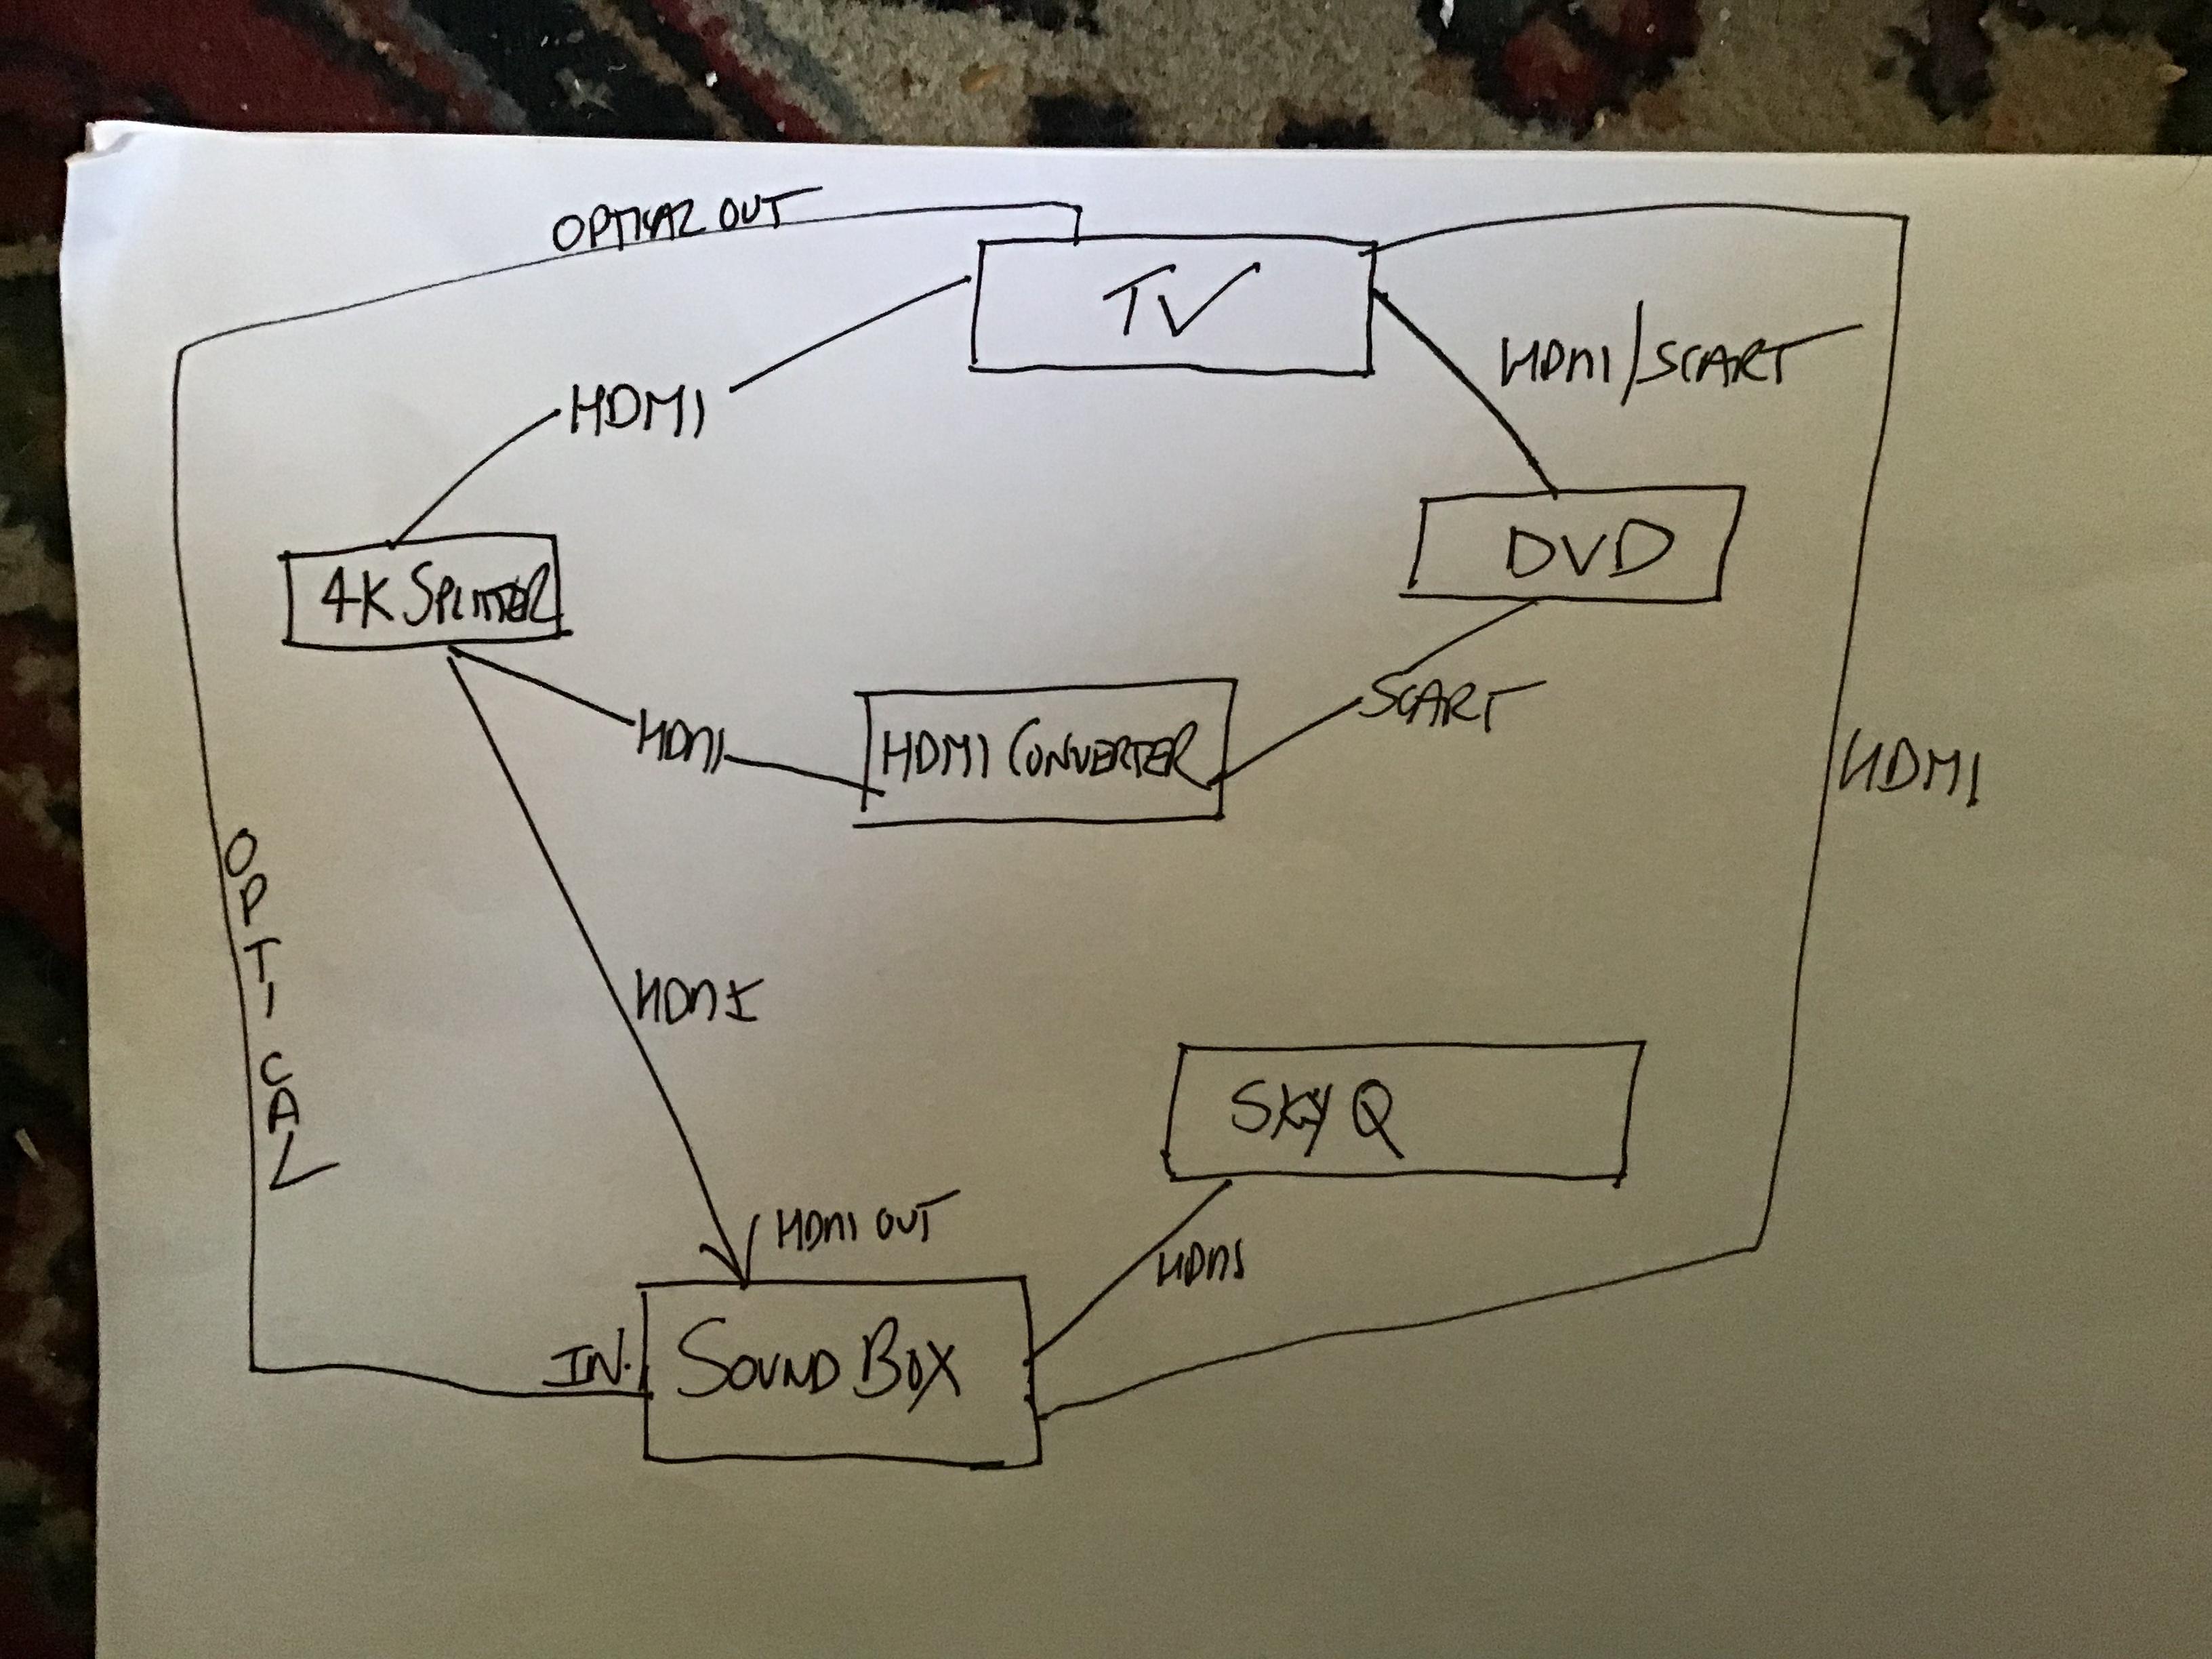 Connecting a sky q box to dvd recorder sou